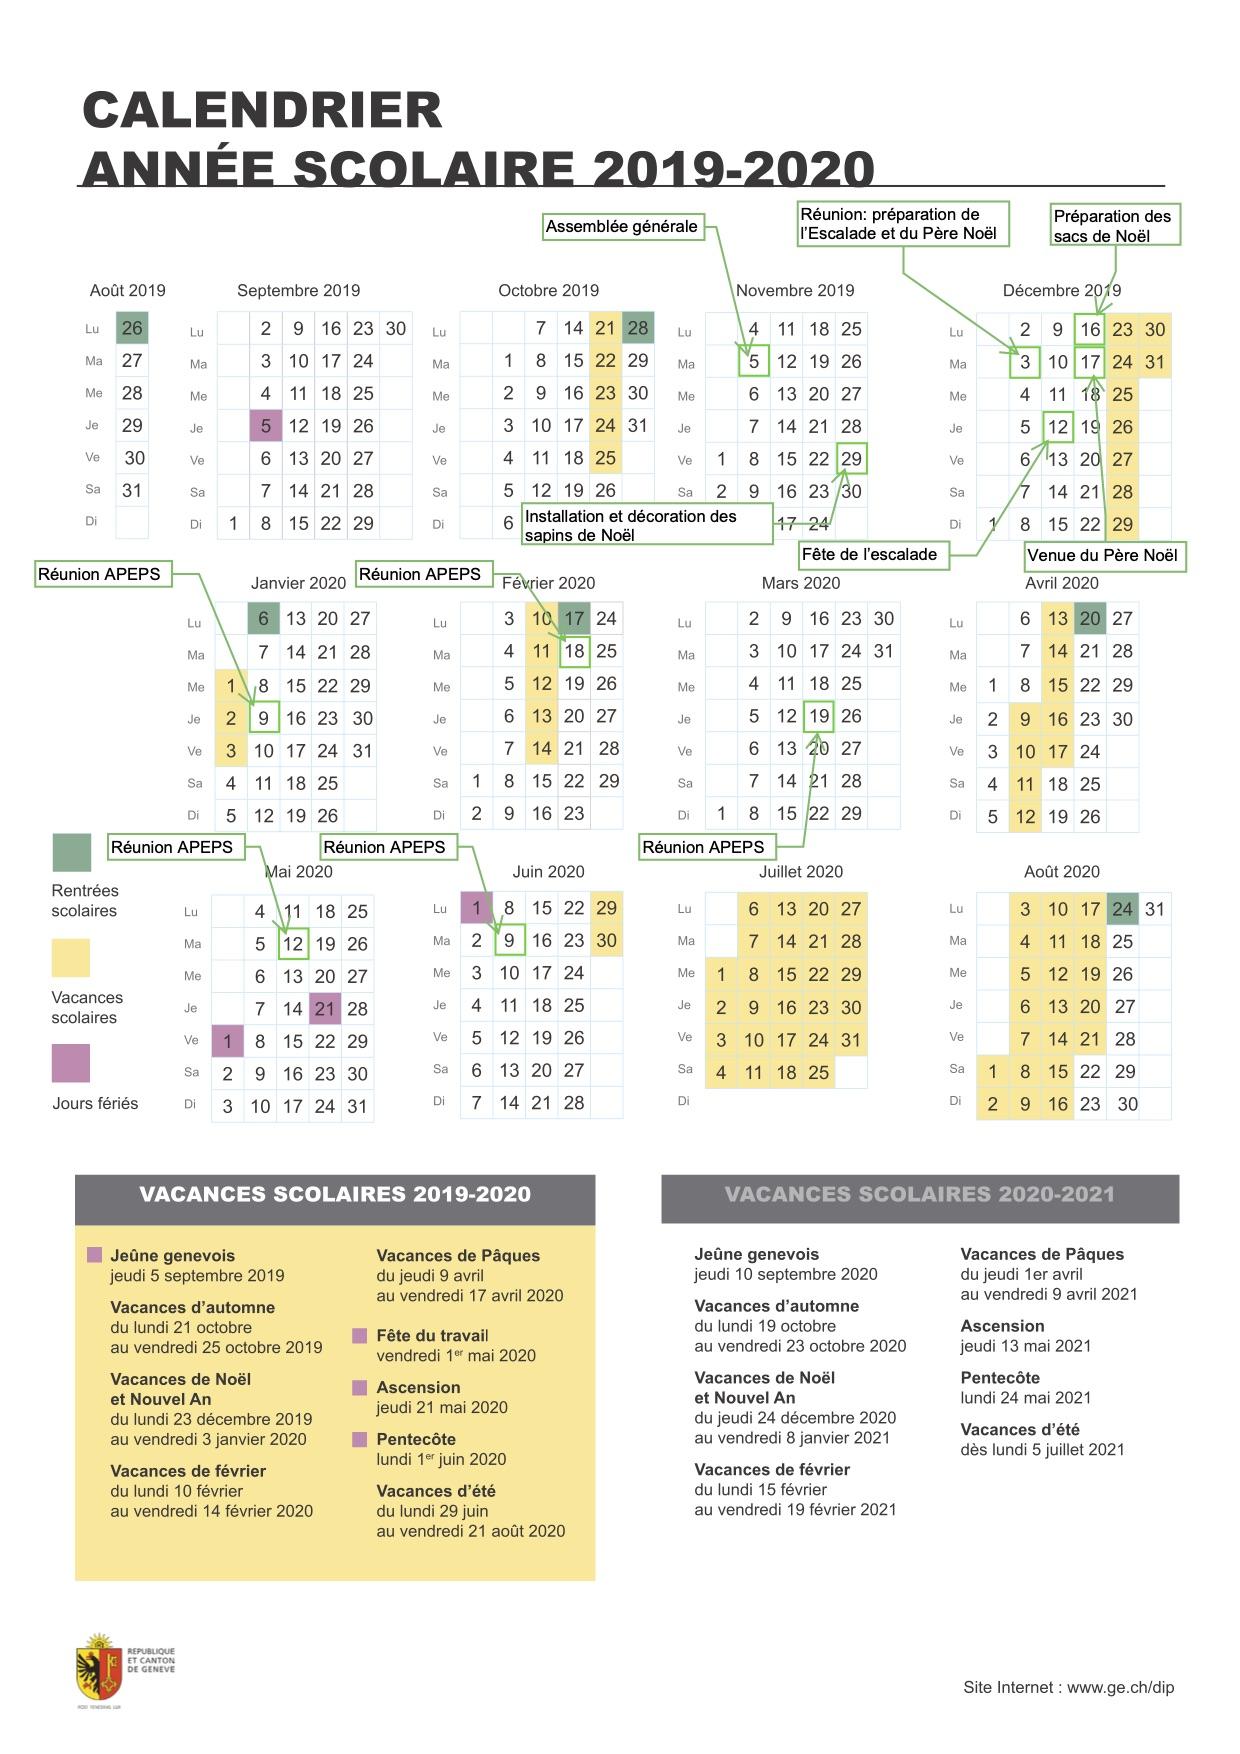 Calendrier APEPS 2019-2020